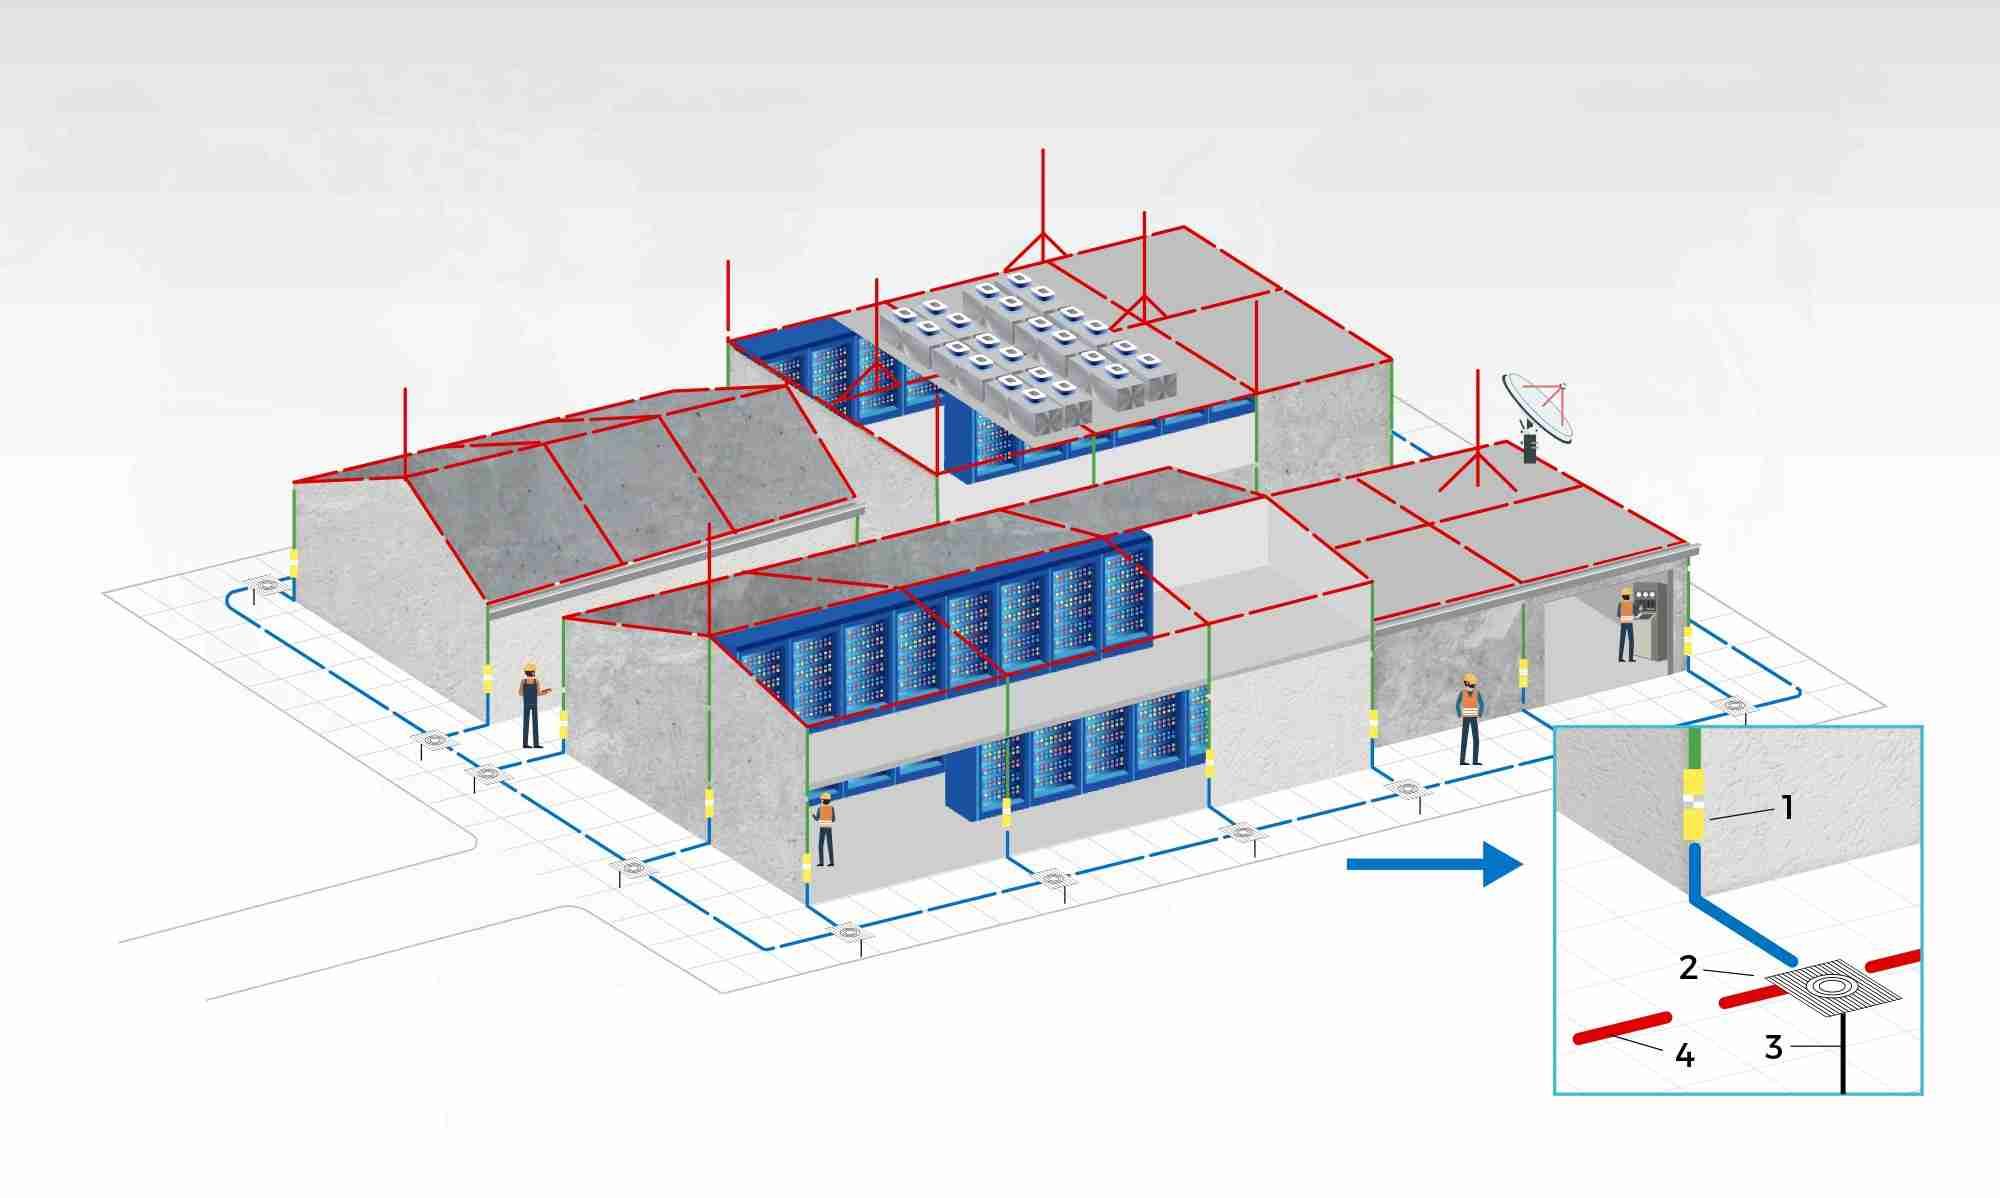 LPI Earthing System